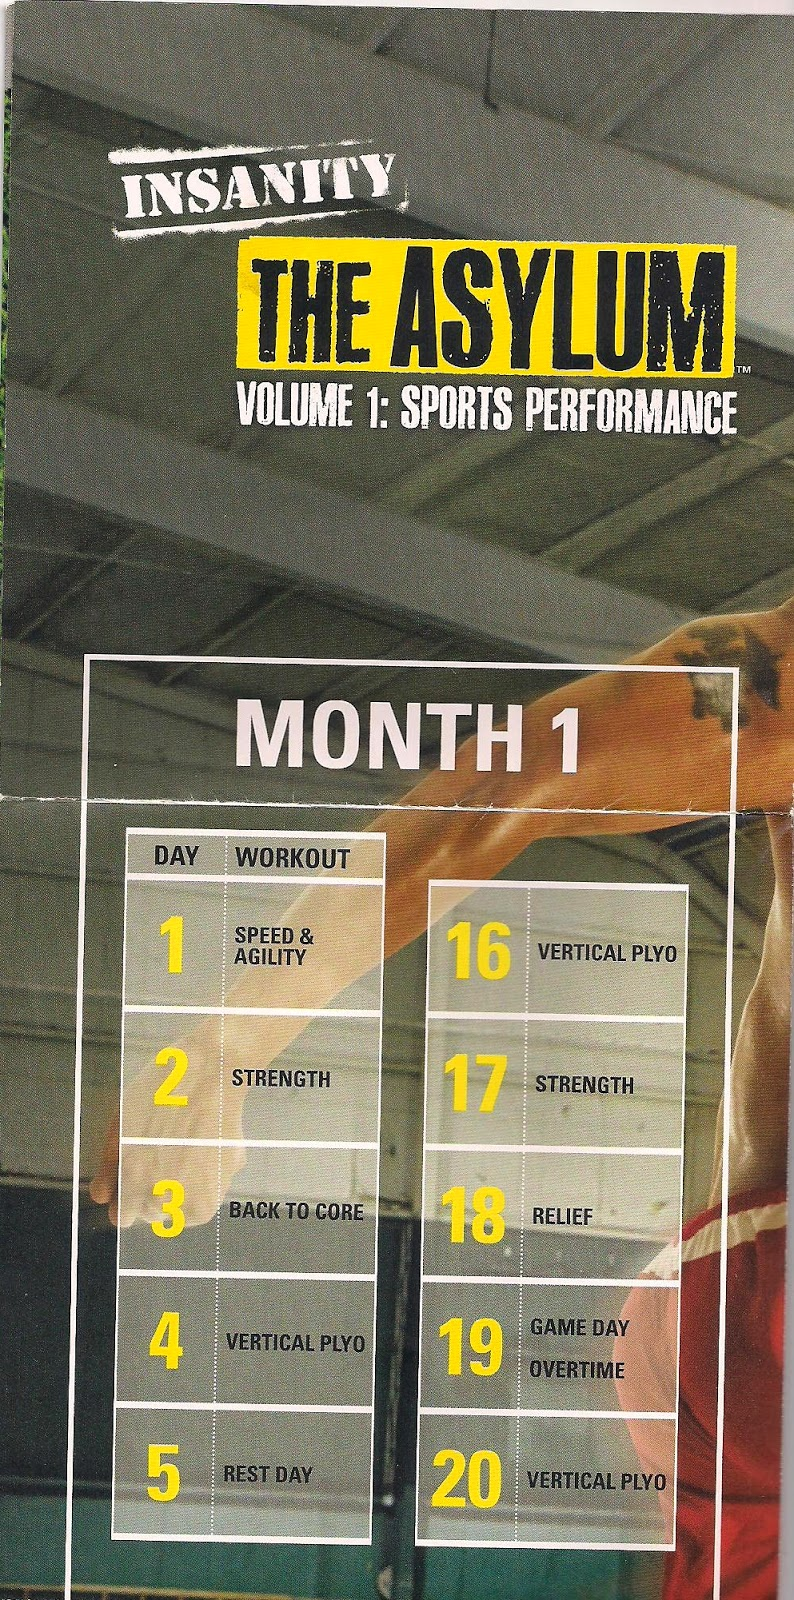 Insanity Asylum Volume 1 Calendar : insanity, asylum, volume, calendar, Project, Insanity, Asylum, Volume